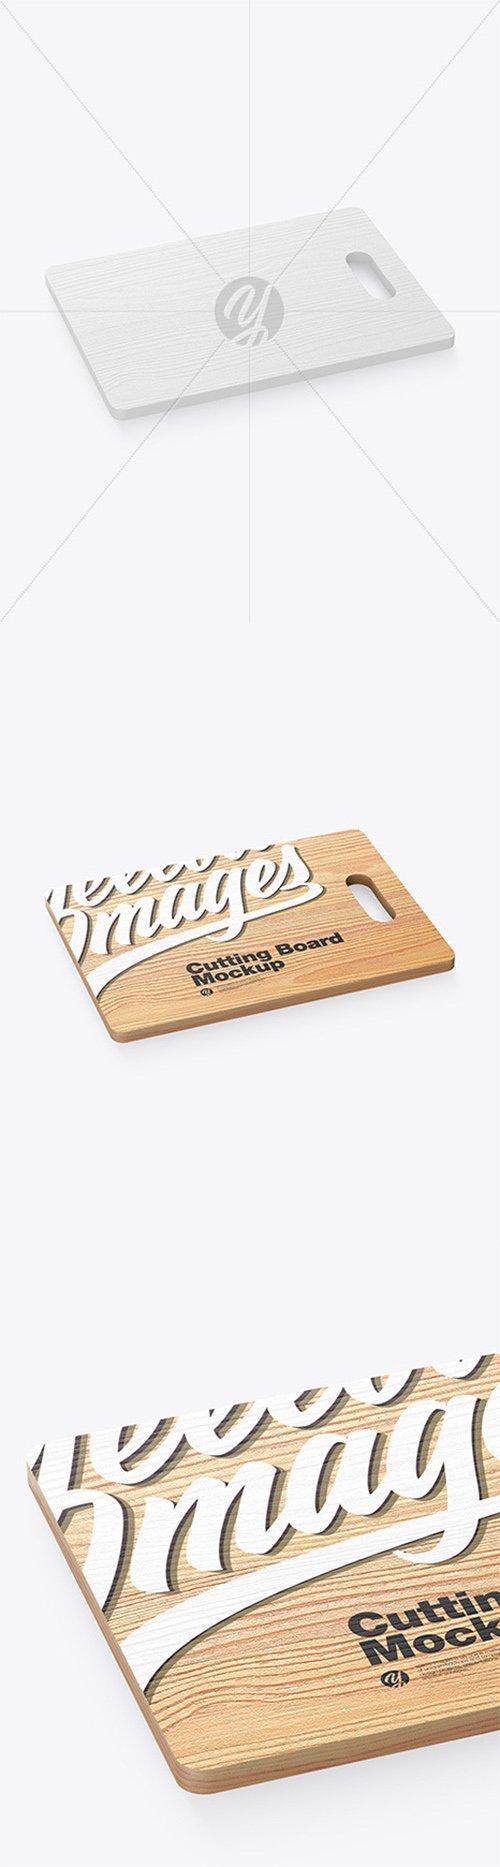 Wooden Cutting Board Mockup 60840 TIF